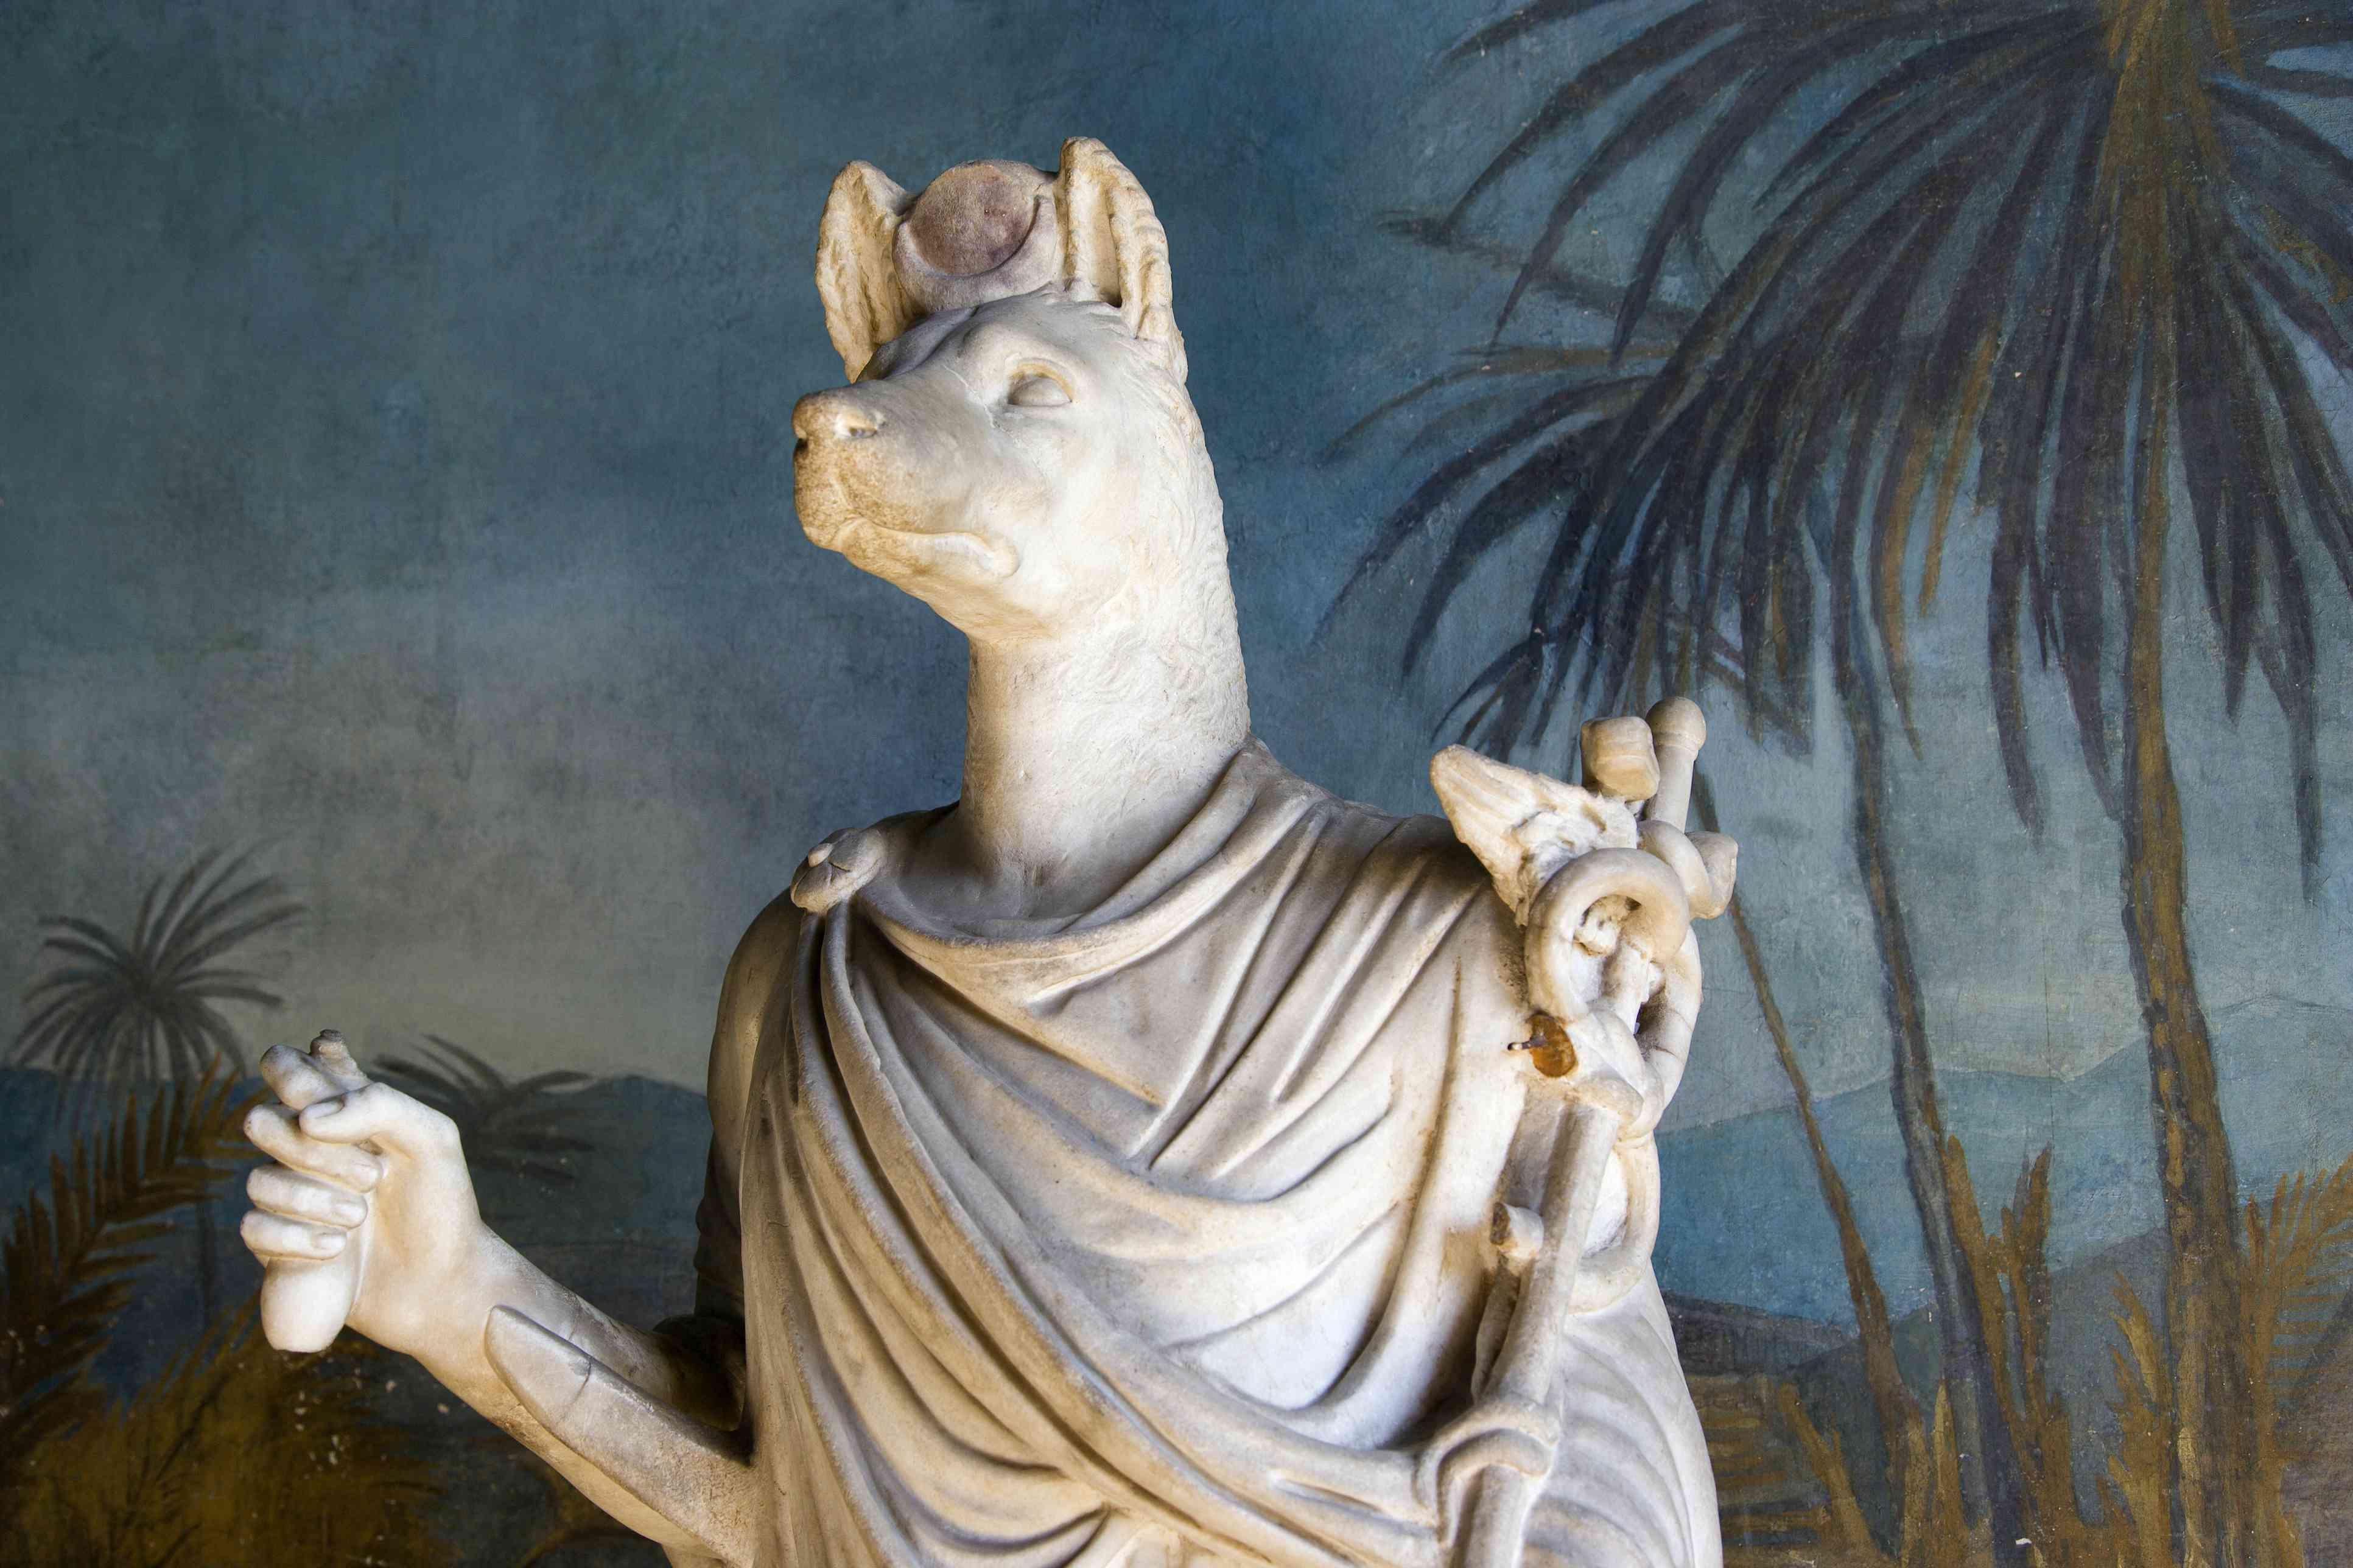 Statue of Anubis at Vatican Museum